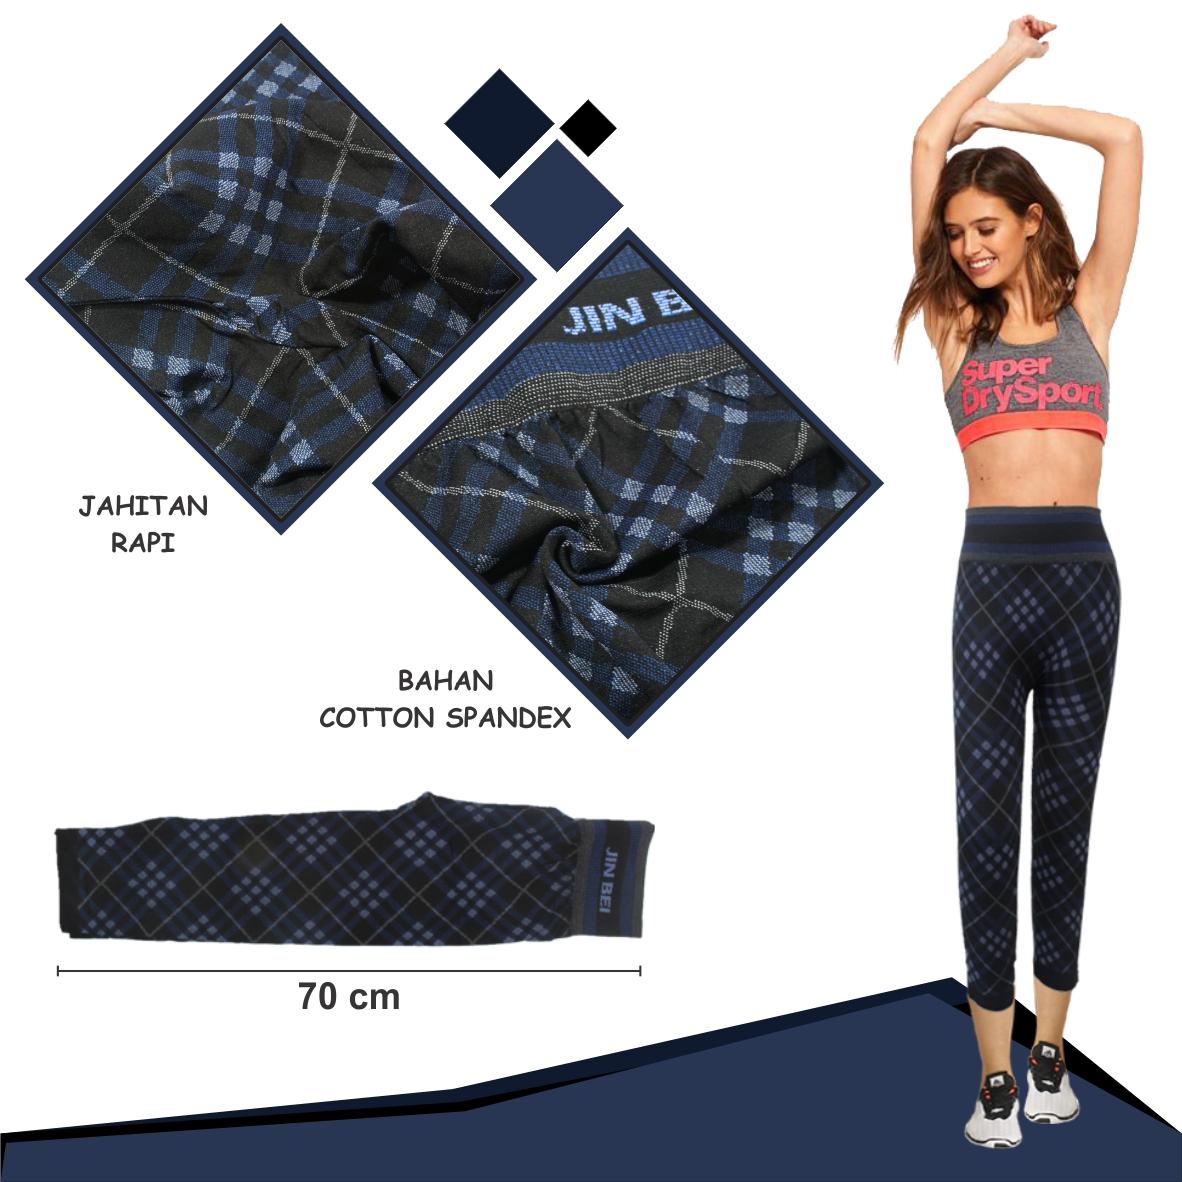 Jual Weitech Sports Legging Celana Legging Olahraga Wanita Celana Yoga Celana Senam Celana Olahraga Pendek 601 Merah S Sukses Techindo